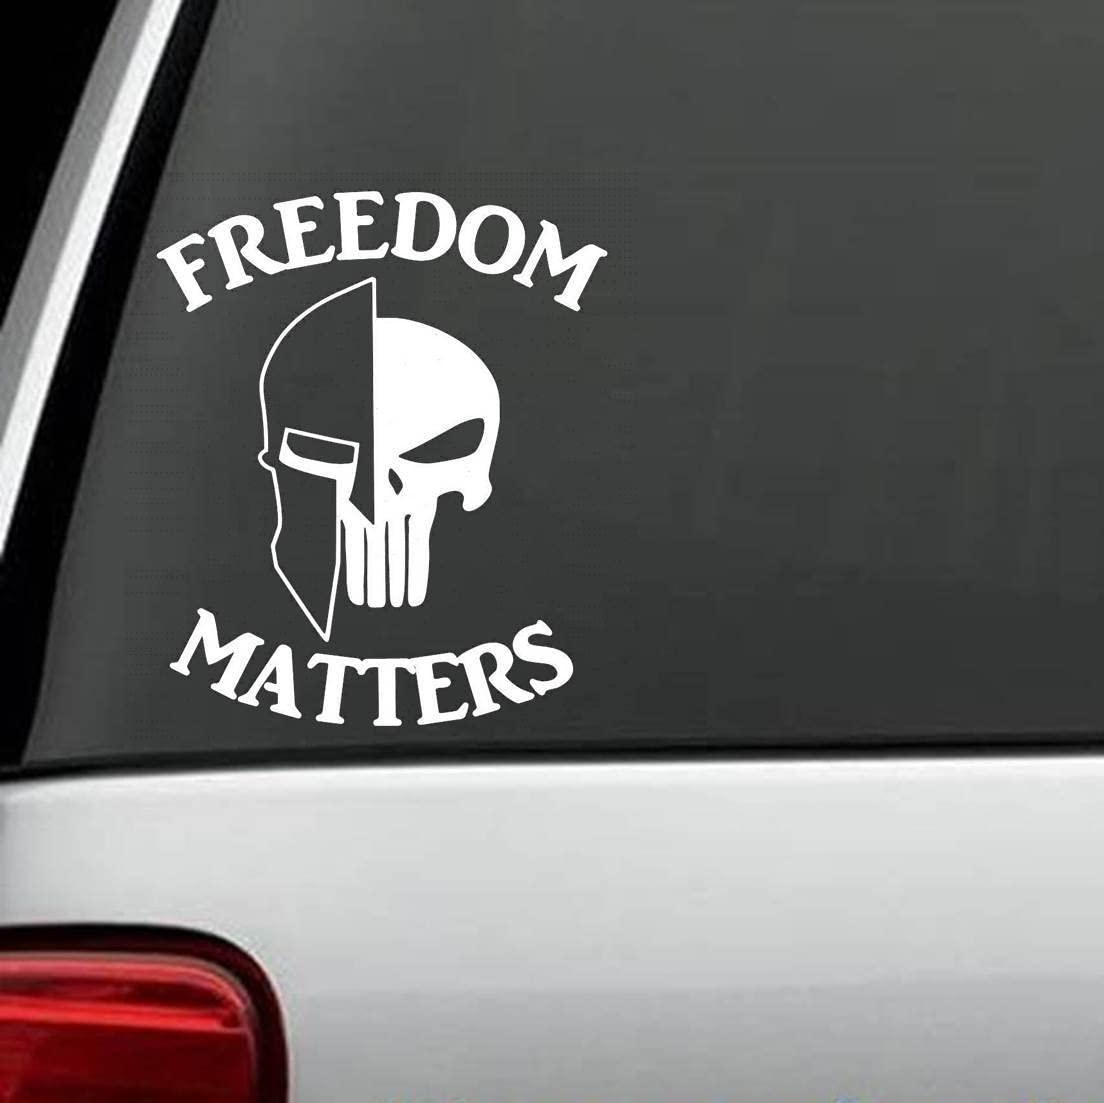 C1104 Freedom Matters Molon Labe Helmet Skull Decal Sticker ...